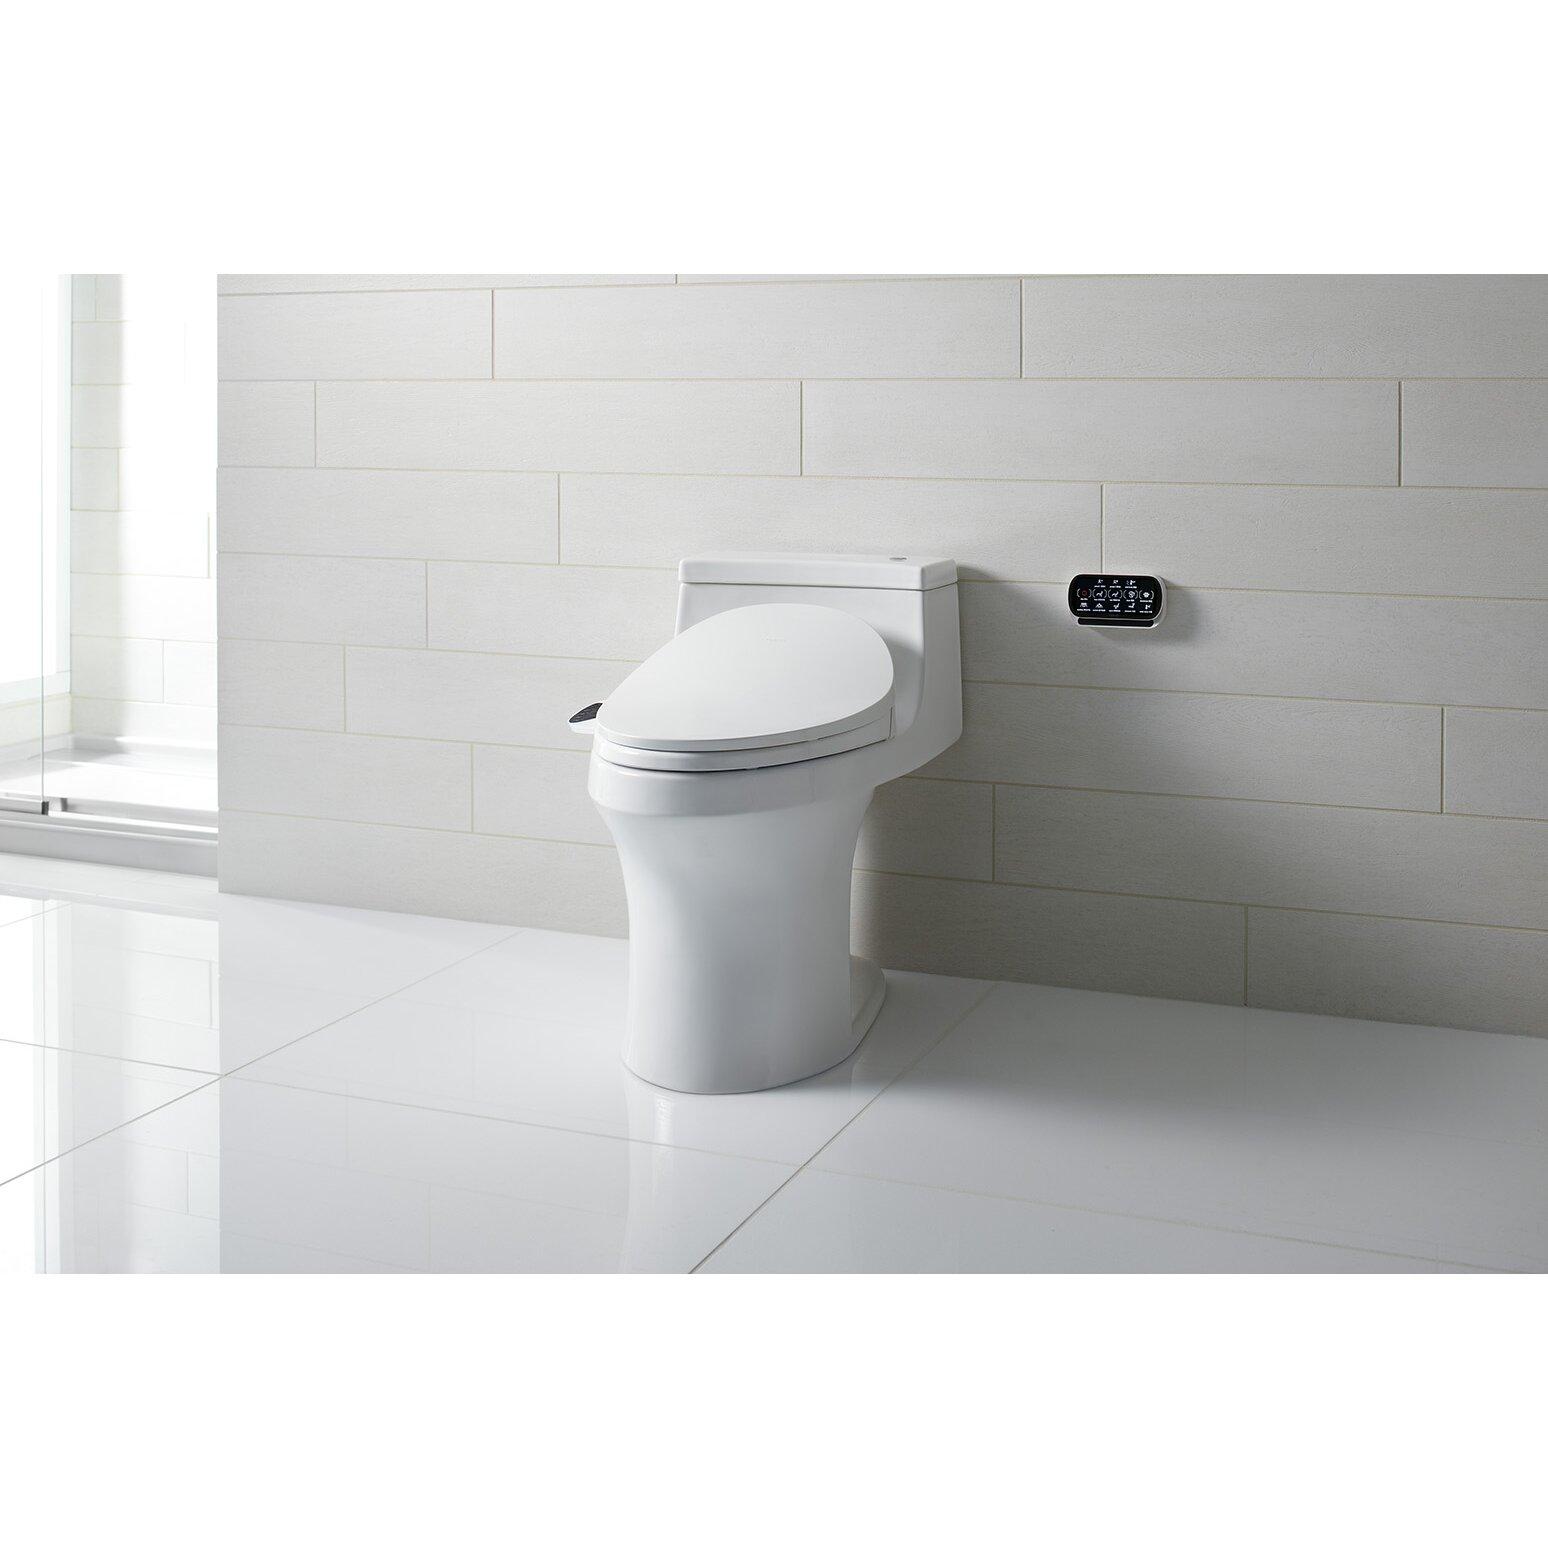 Kohler C3 230 C3 230 Elongated Bidet Toilet Seat With In